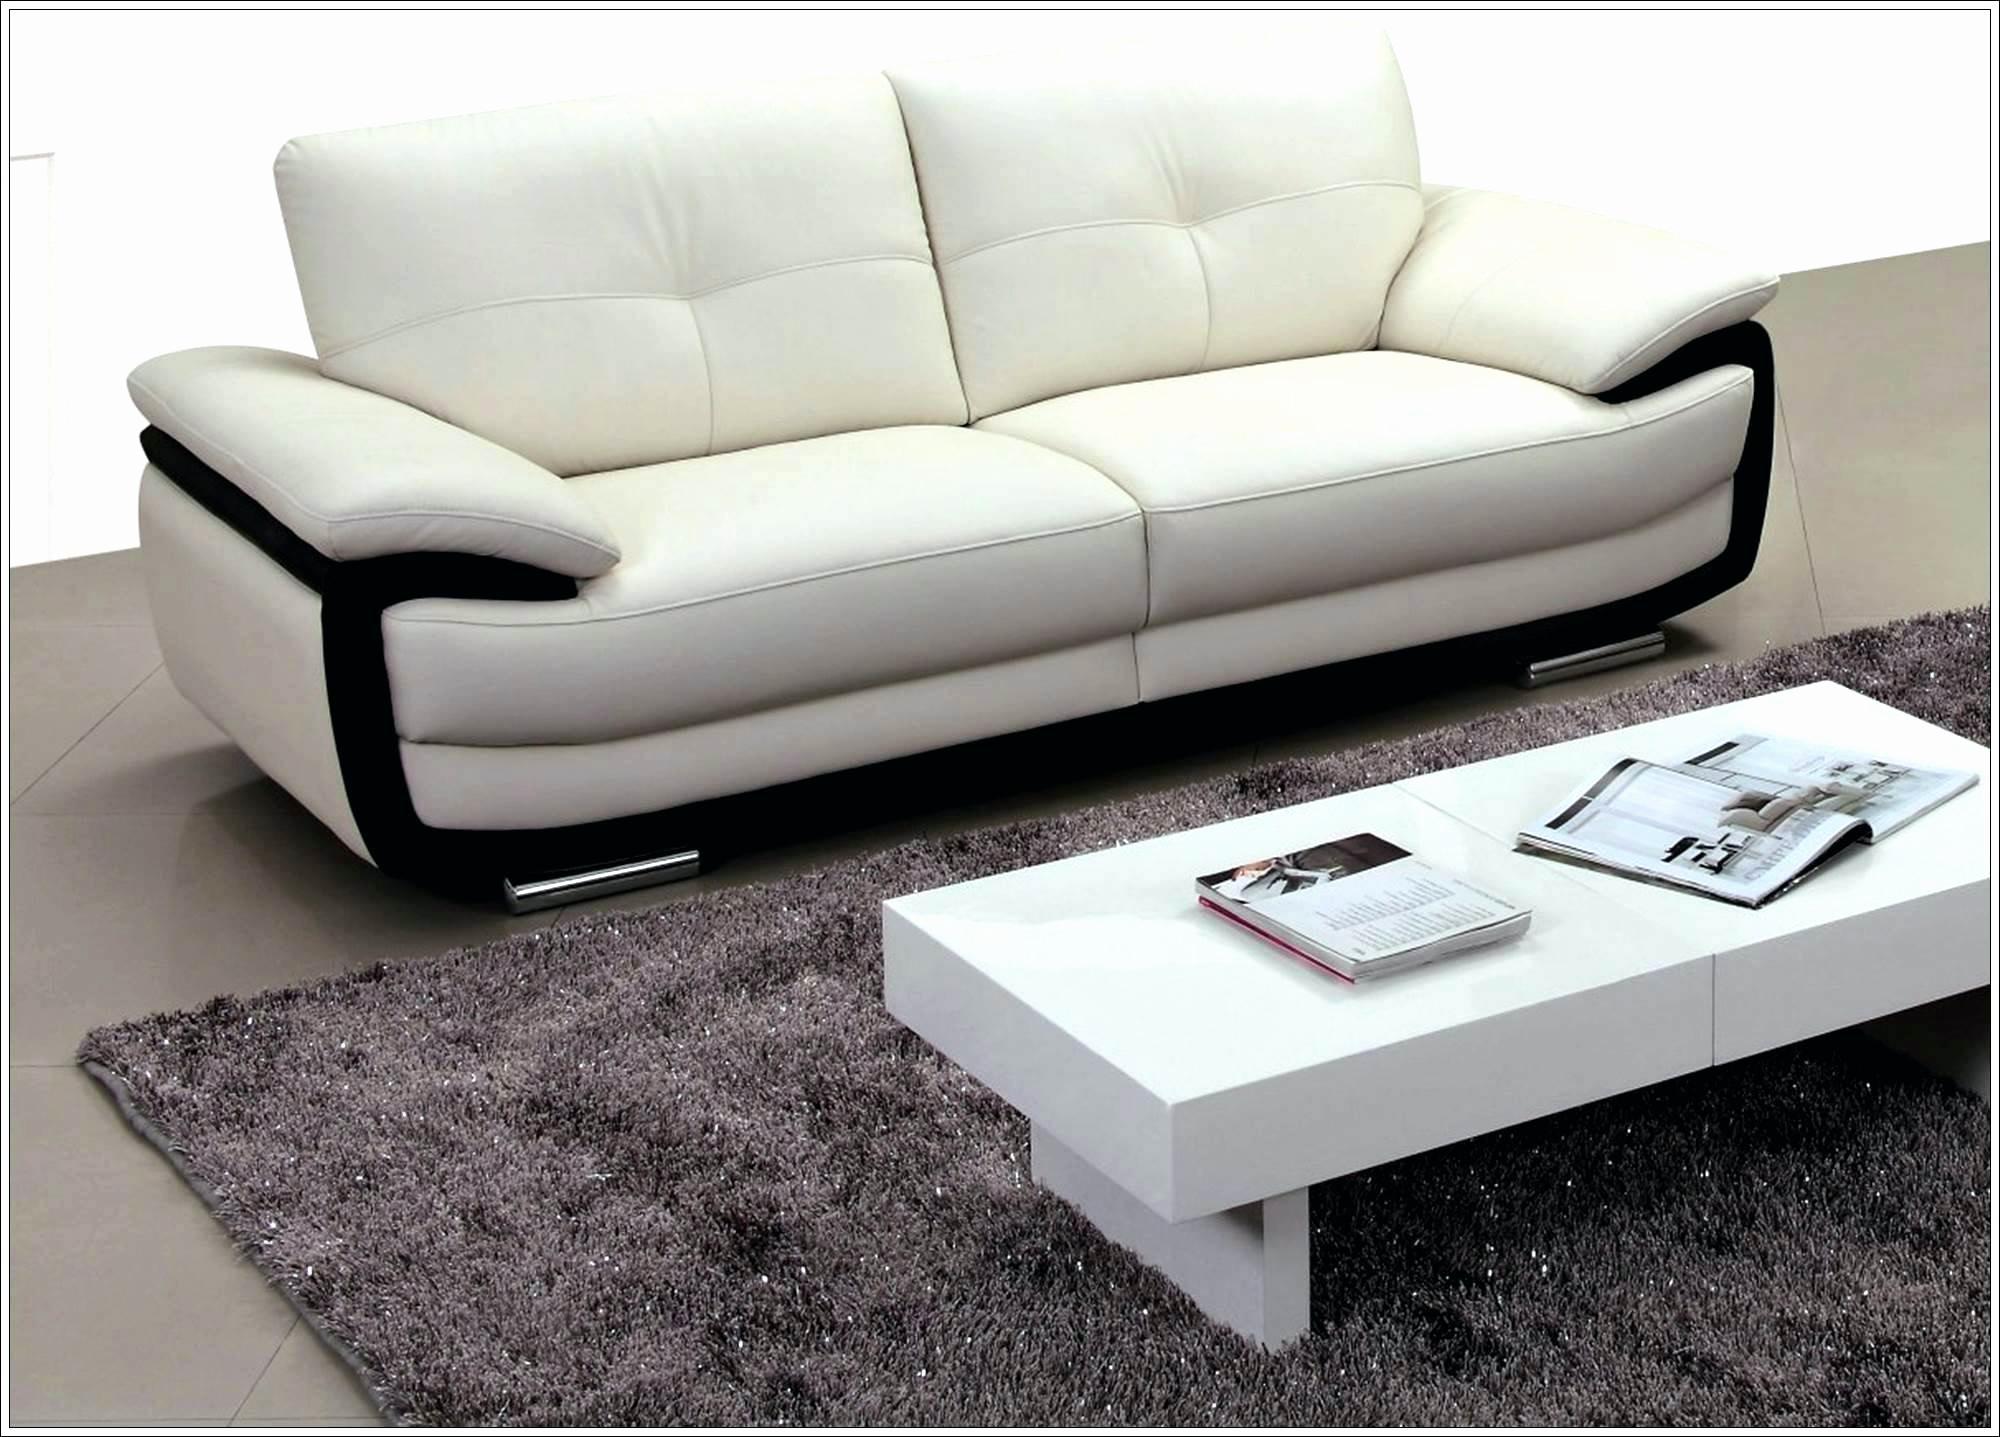 Canapé Lit Gigogne Ikea Inspirant Photos Canap Convertible 3 Places Conforama 11 Lit 2 Pas Cher Ikea but